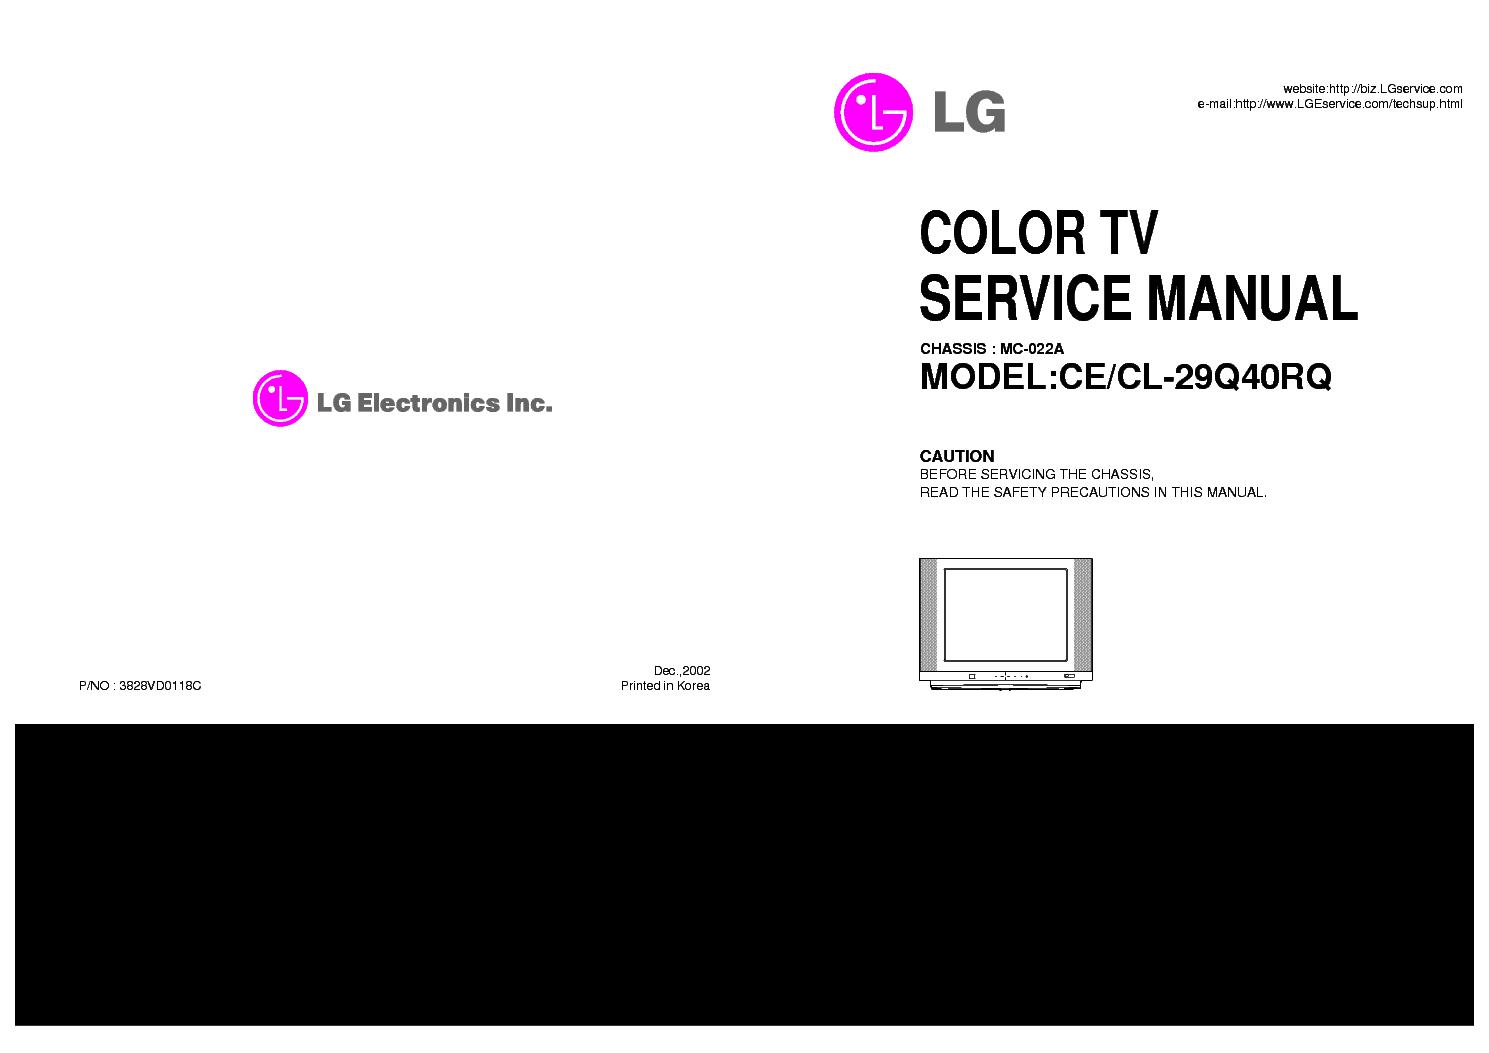 lg mc006 service manual free download schematics eeprom. Black Bedroom Furniture Sets. Home Design Ideas